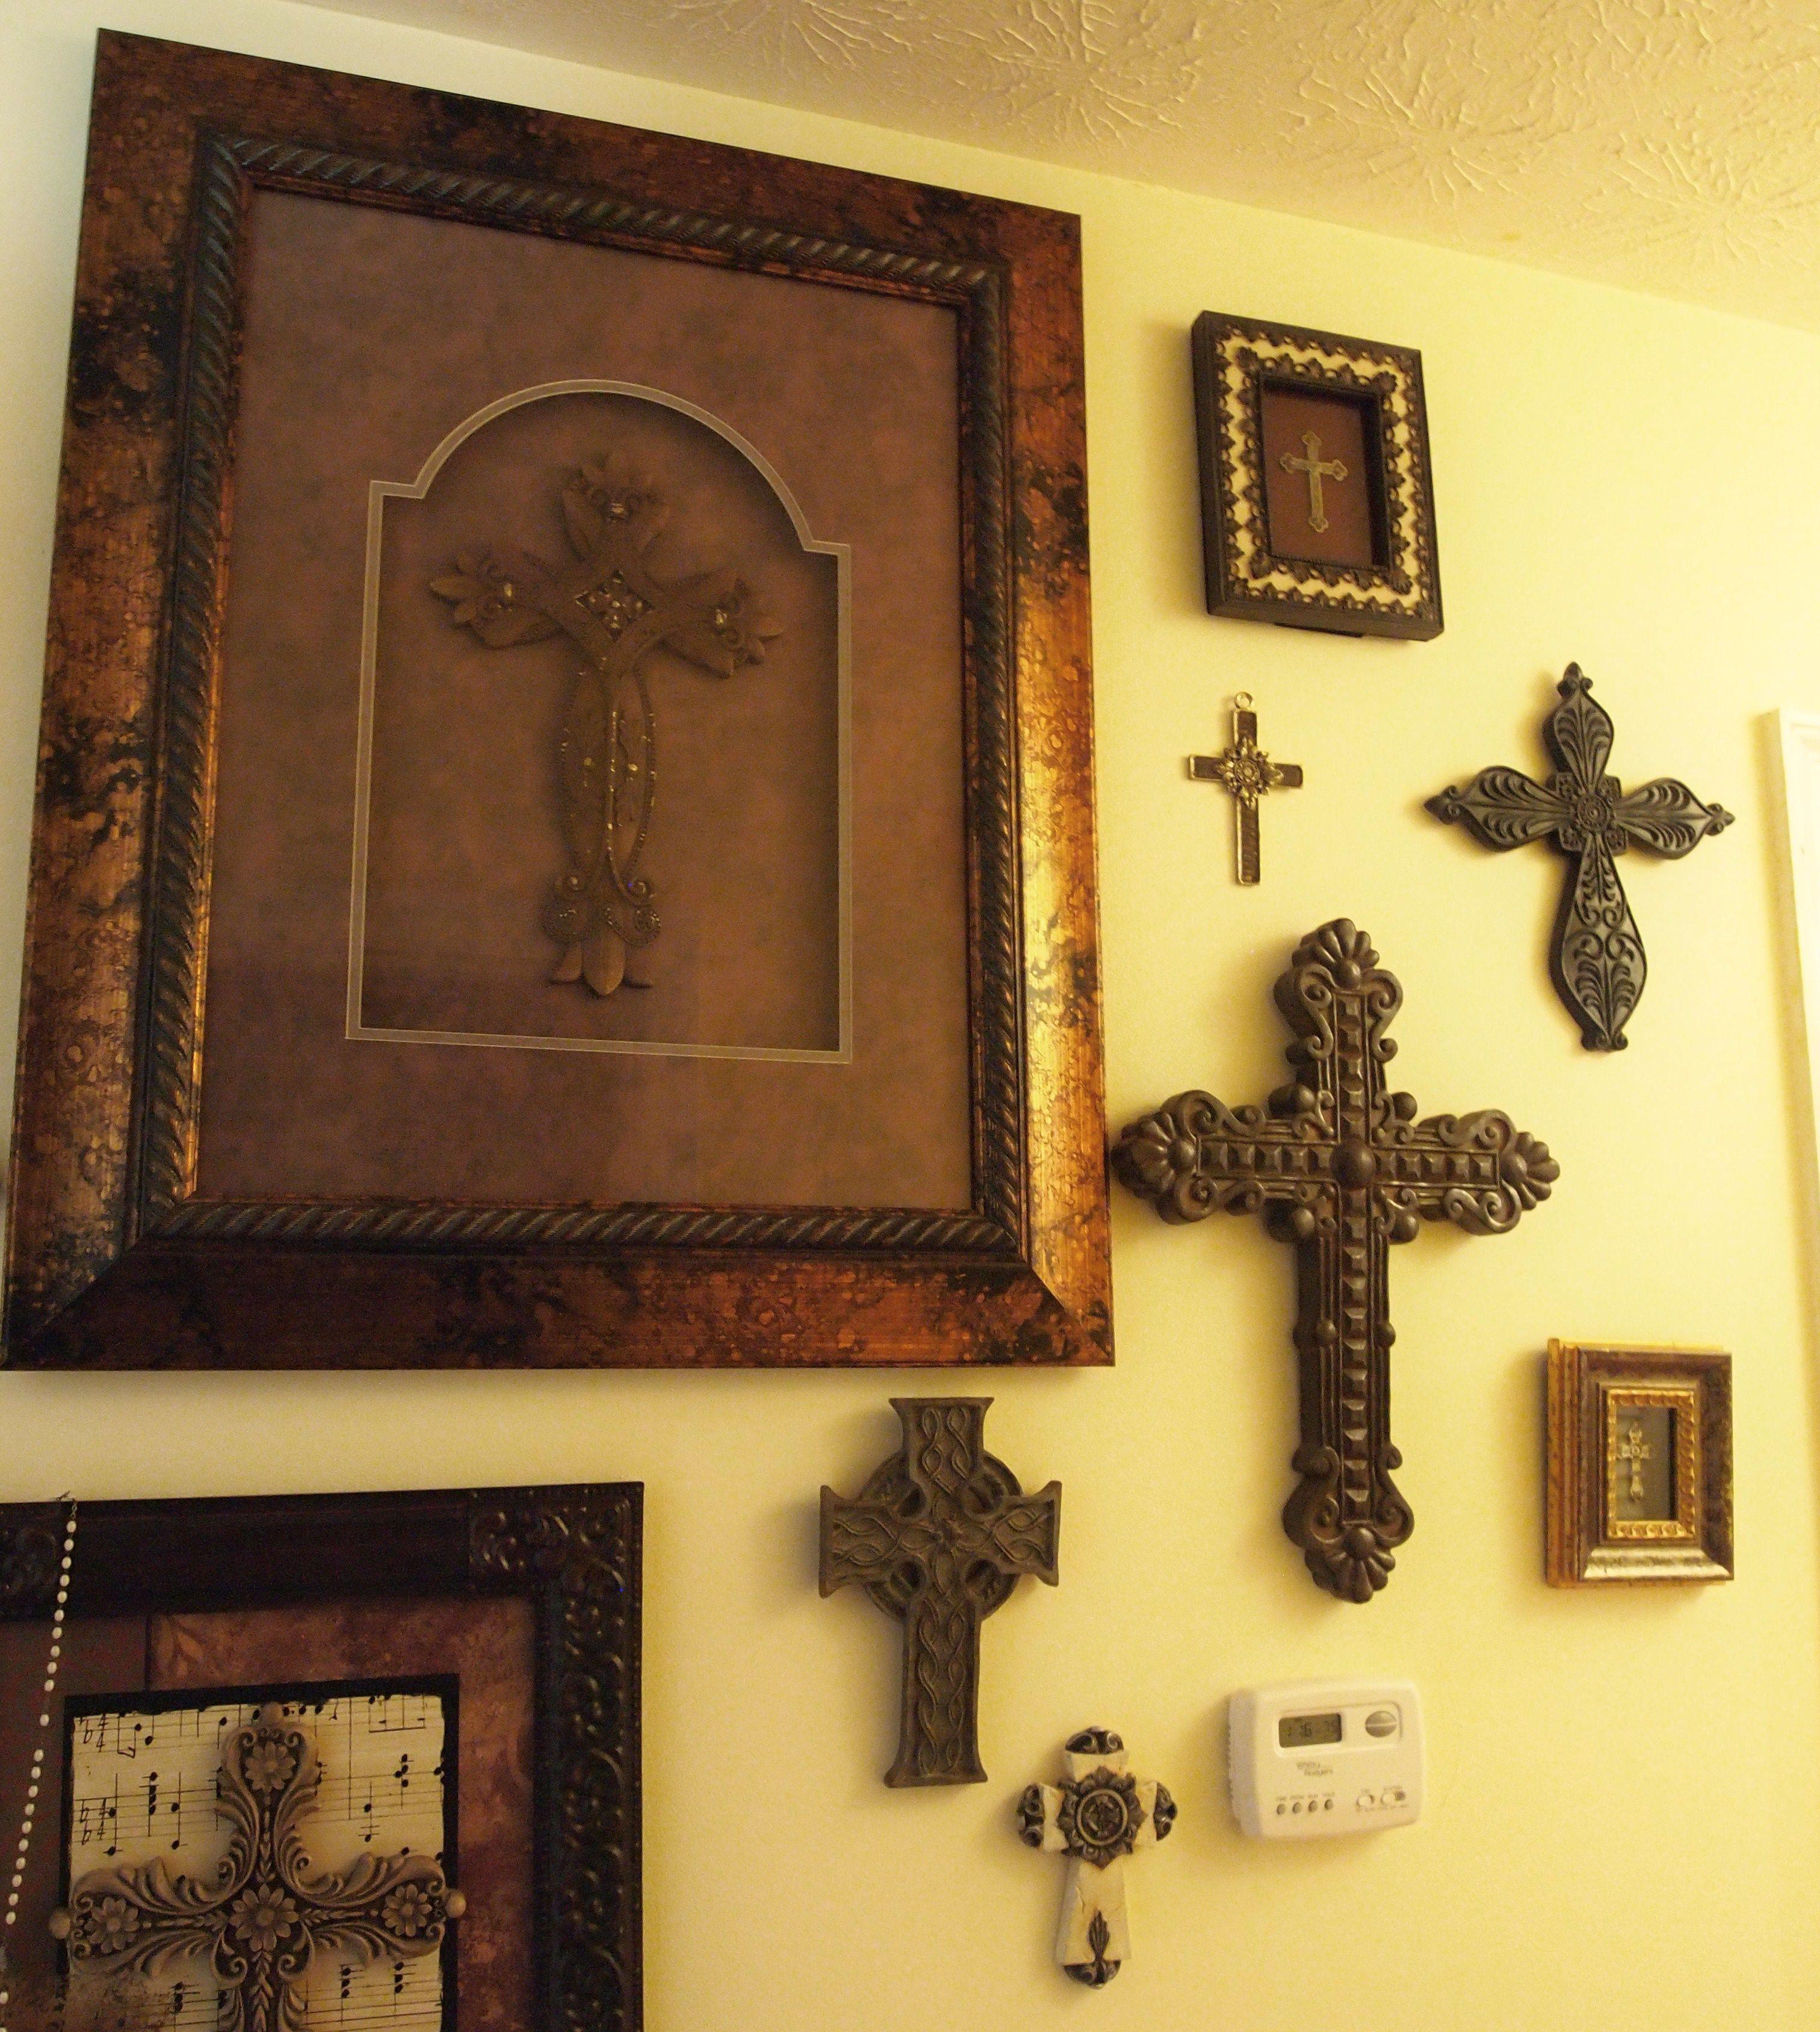 Free photo: Cross on wall - Religion, Ornament, Jesus - Free ...